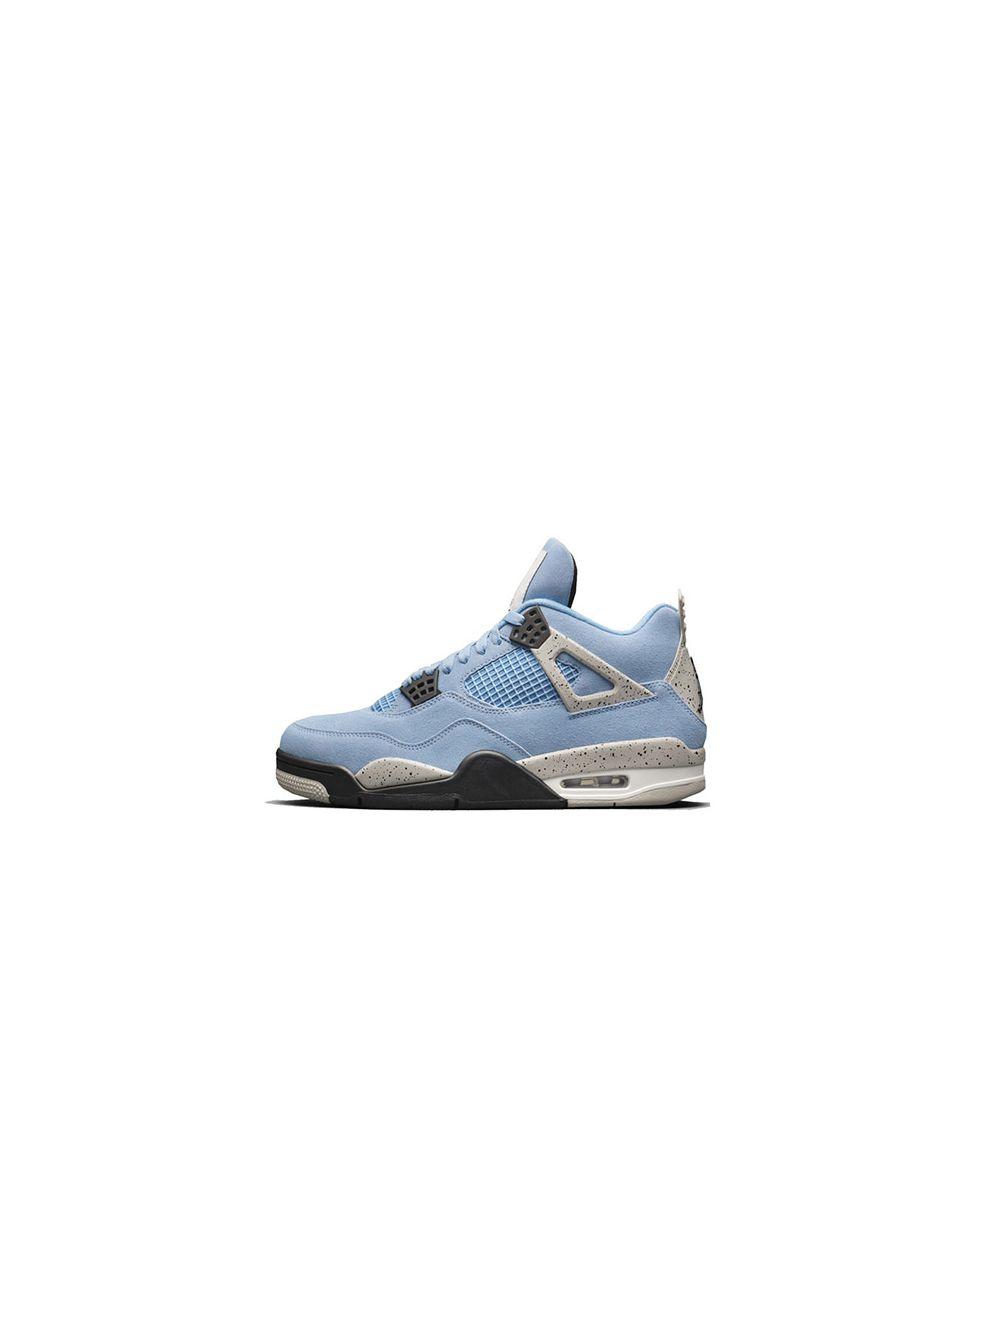 Fake Jordan 4 'University Blue'